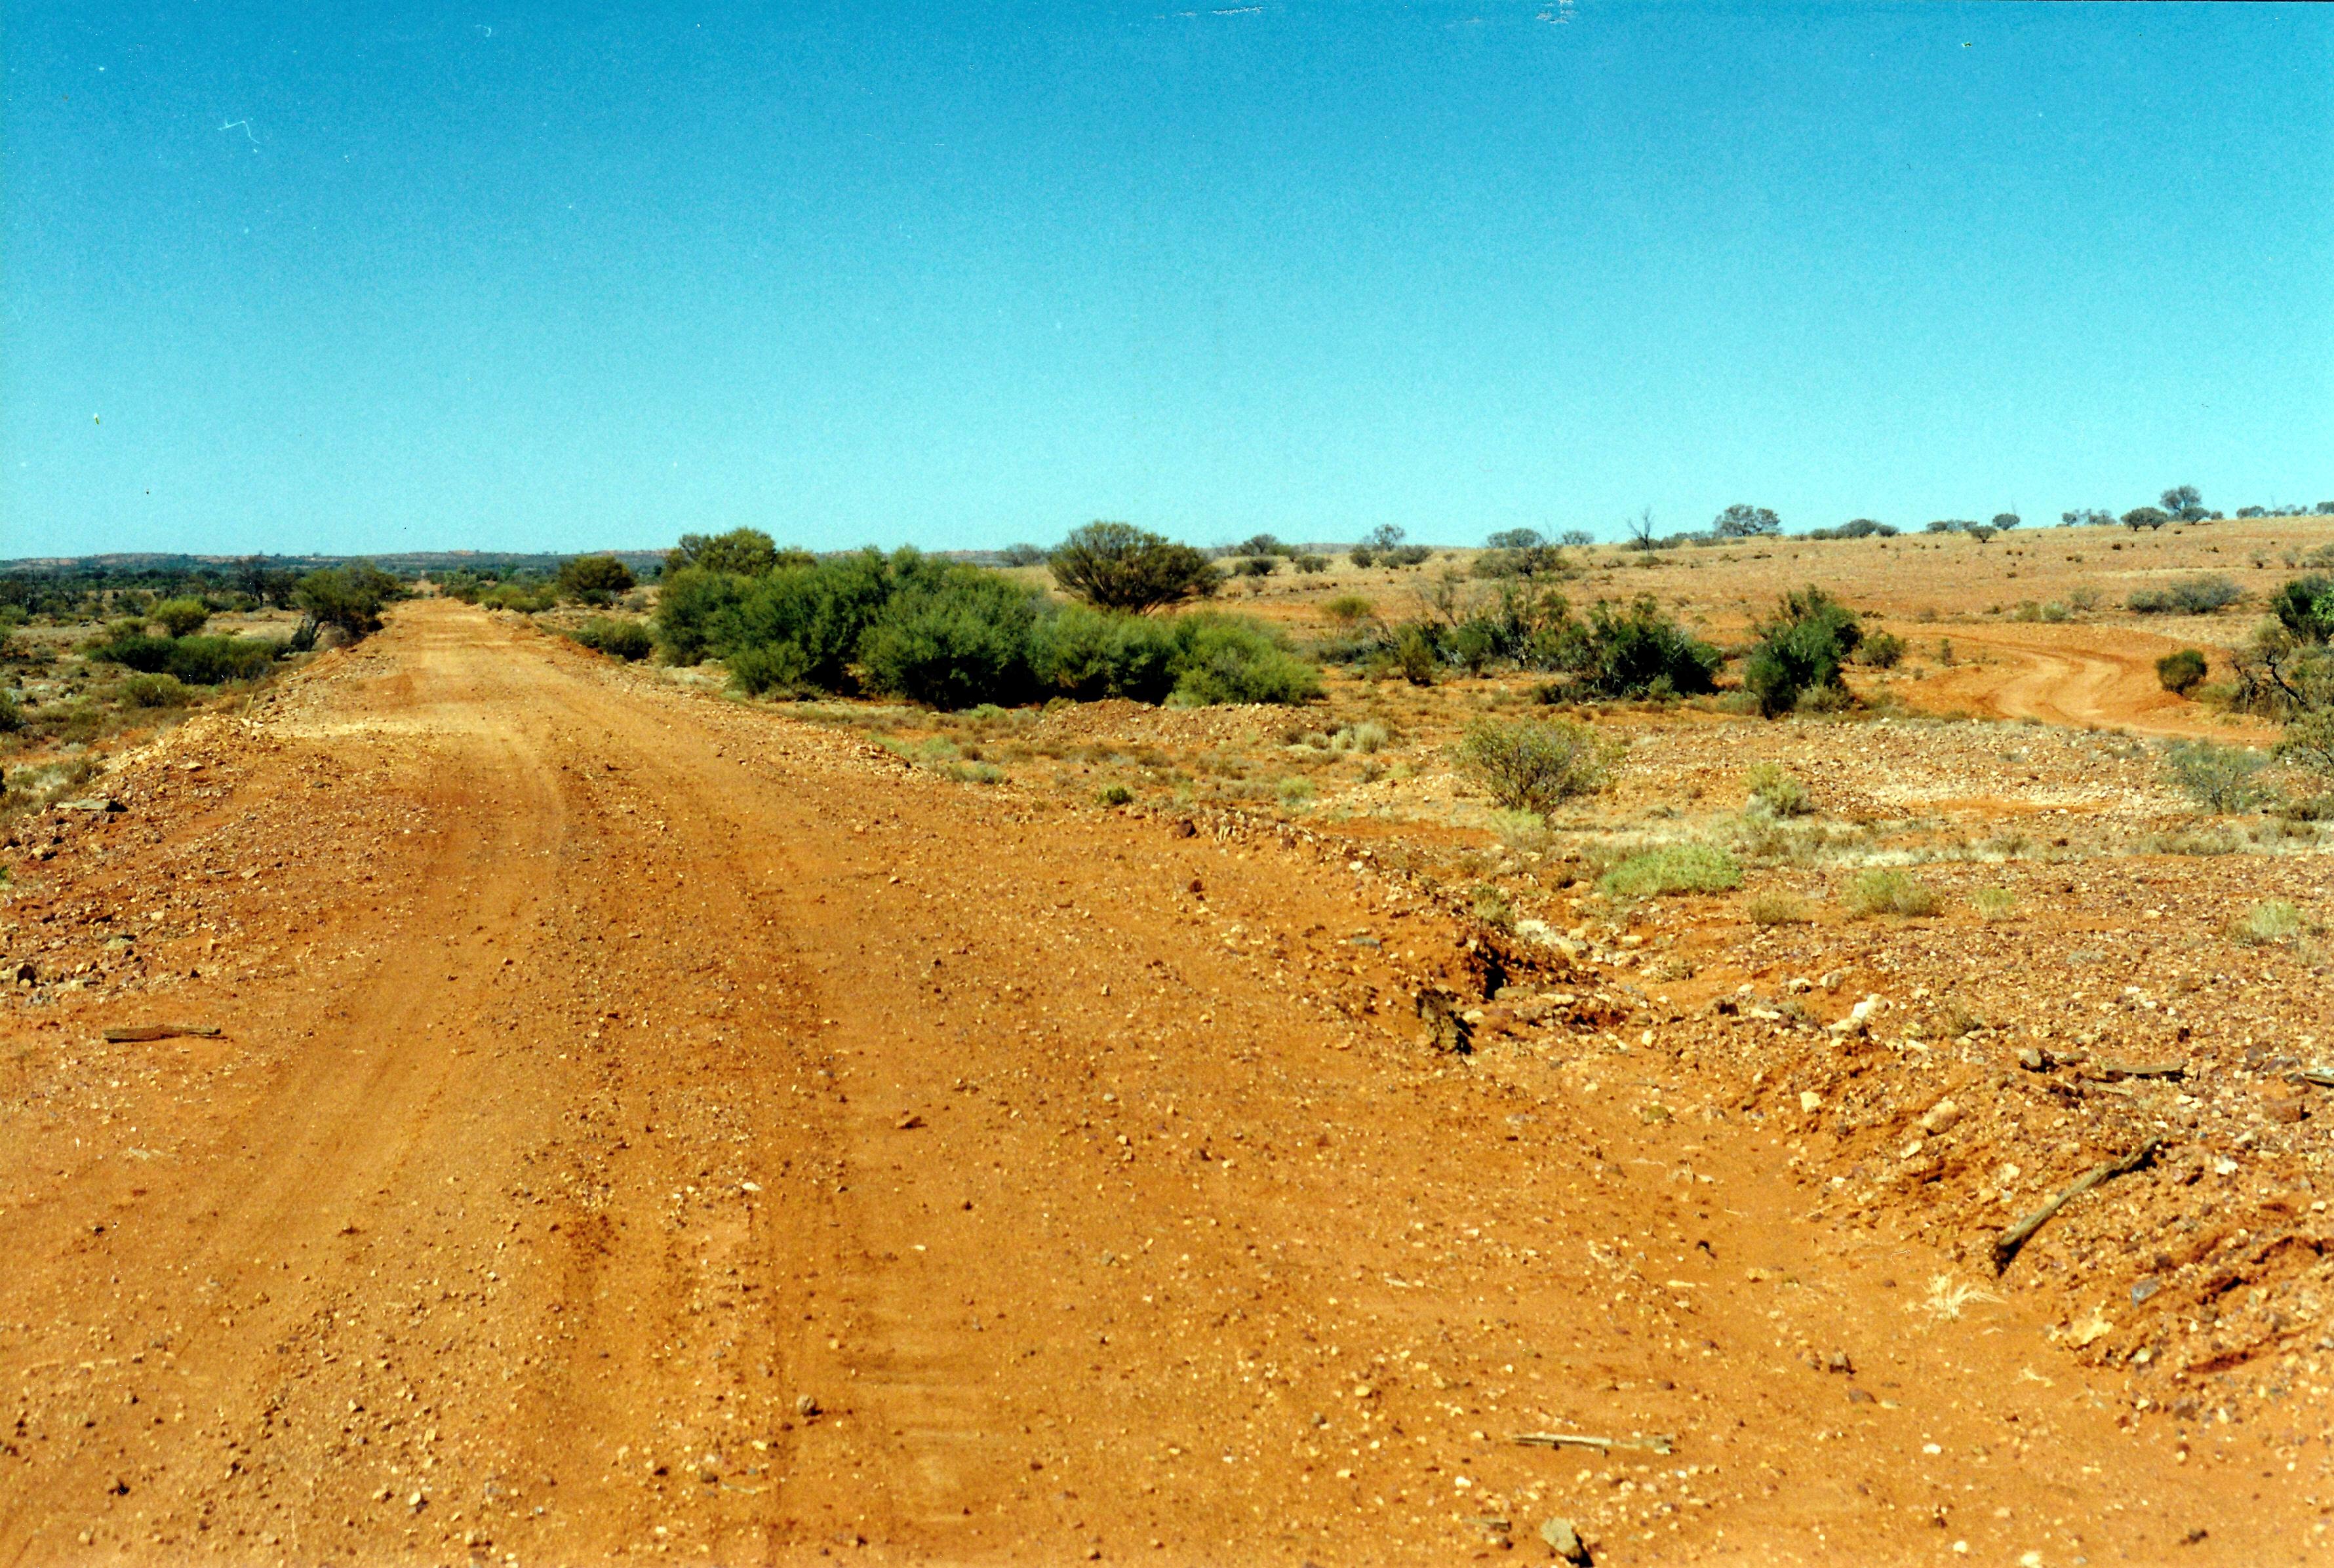 08-13-1999 02  the Old Ghan Track.jpg